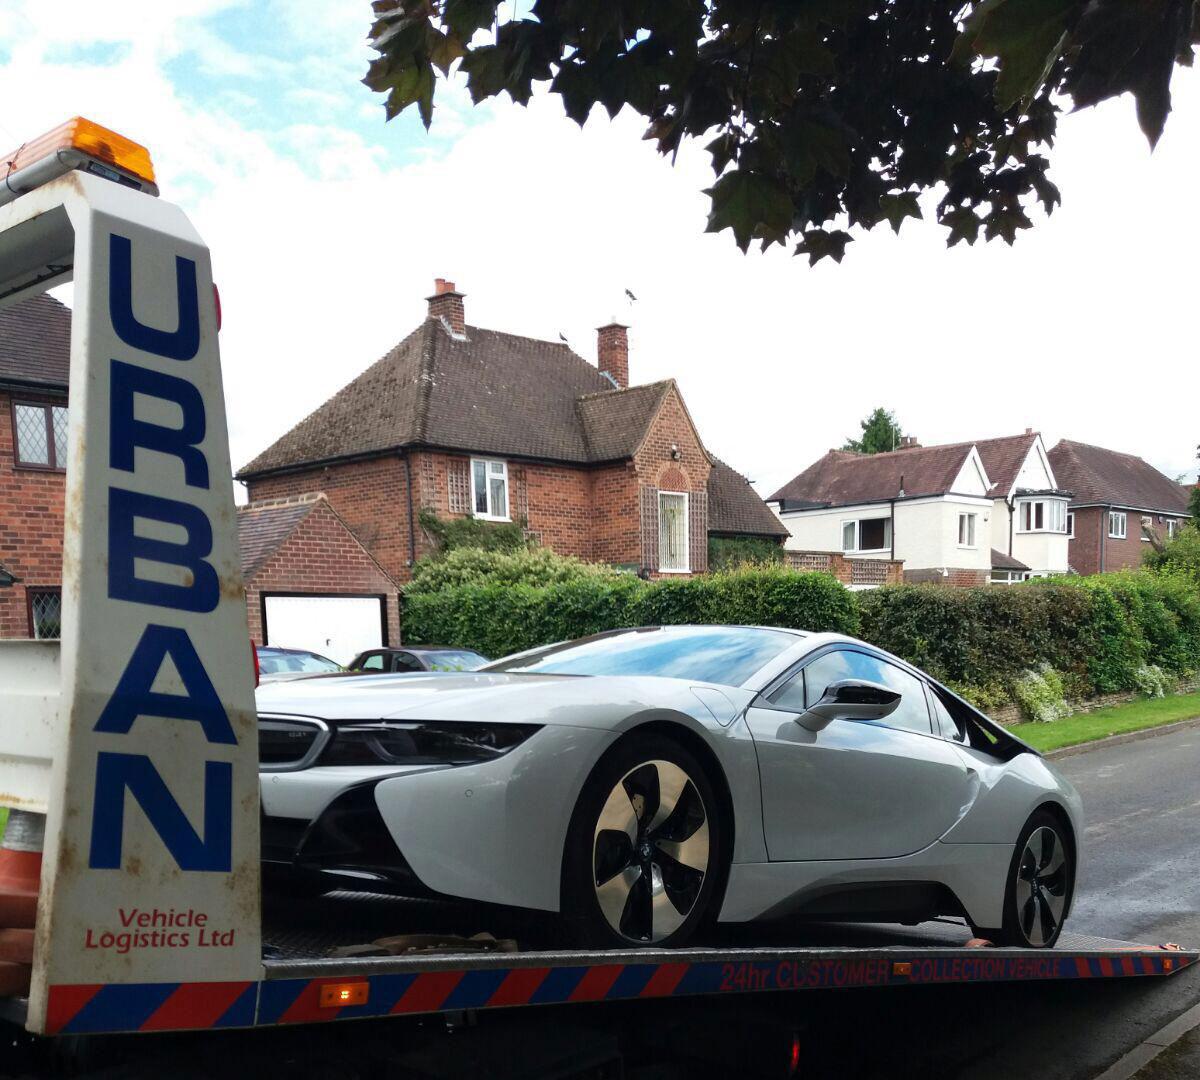 Urban Vehicle Logistics 11